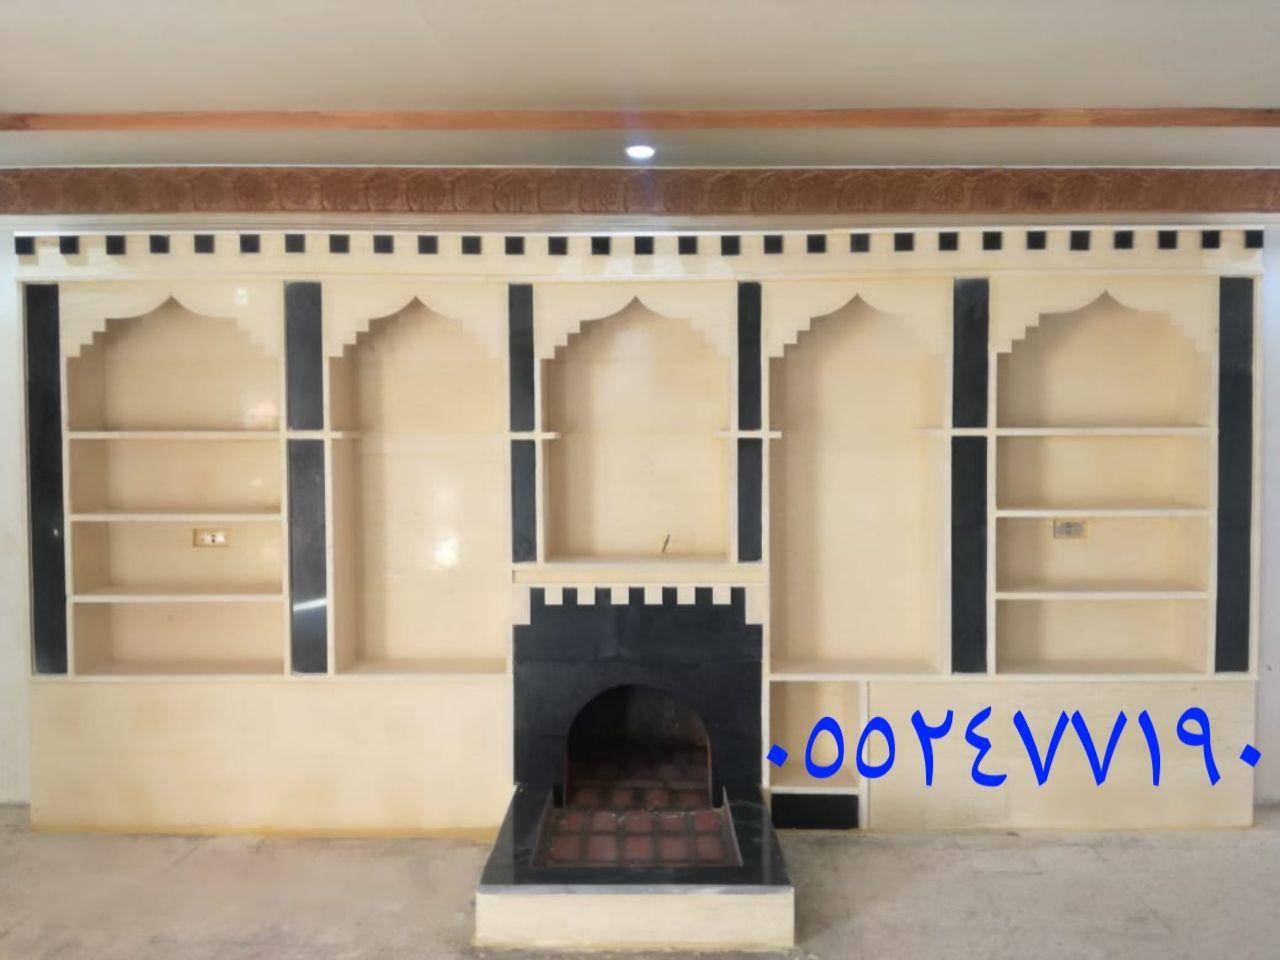 صور جبس حديثه صورمشبات متنقلة صورشواية صورمشبات كهربائية صورمشبات نار حديثه صورمشب خارجي صورتصليح مشبات صورديكورات مدافئ صورد Home Decor Decor Fireplace